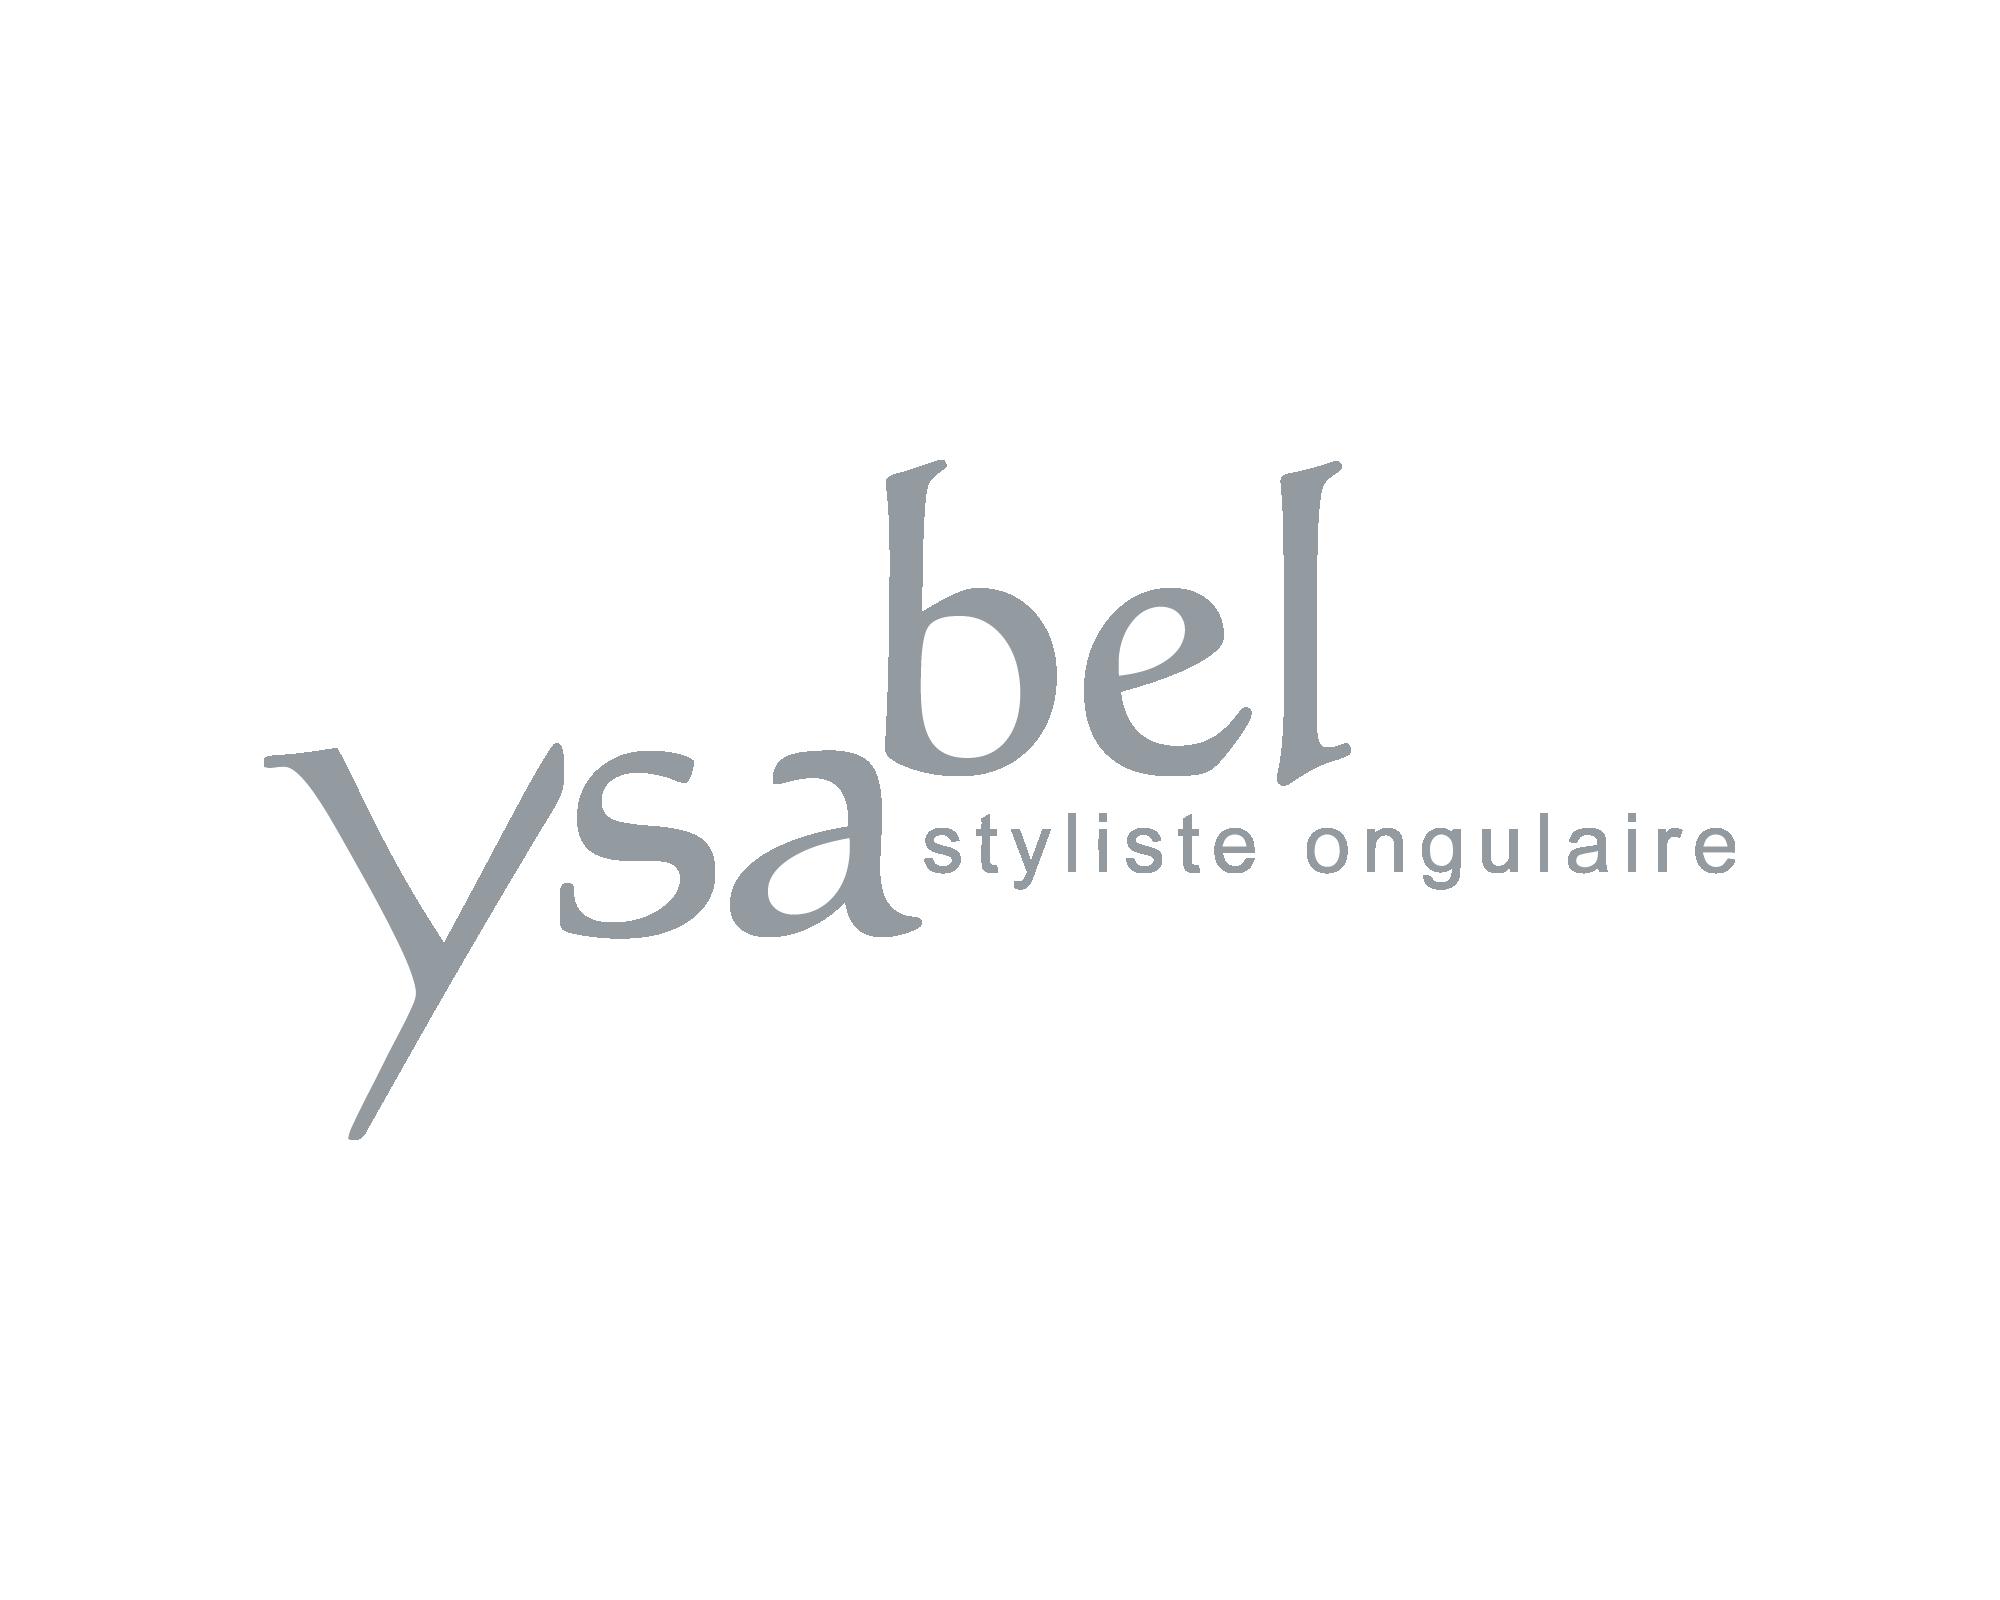 Logo Ysabel, onglerie, nails, styliste ongulaire, ysabel